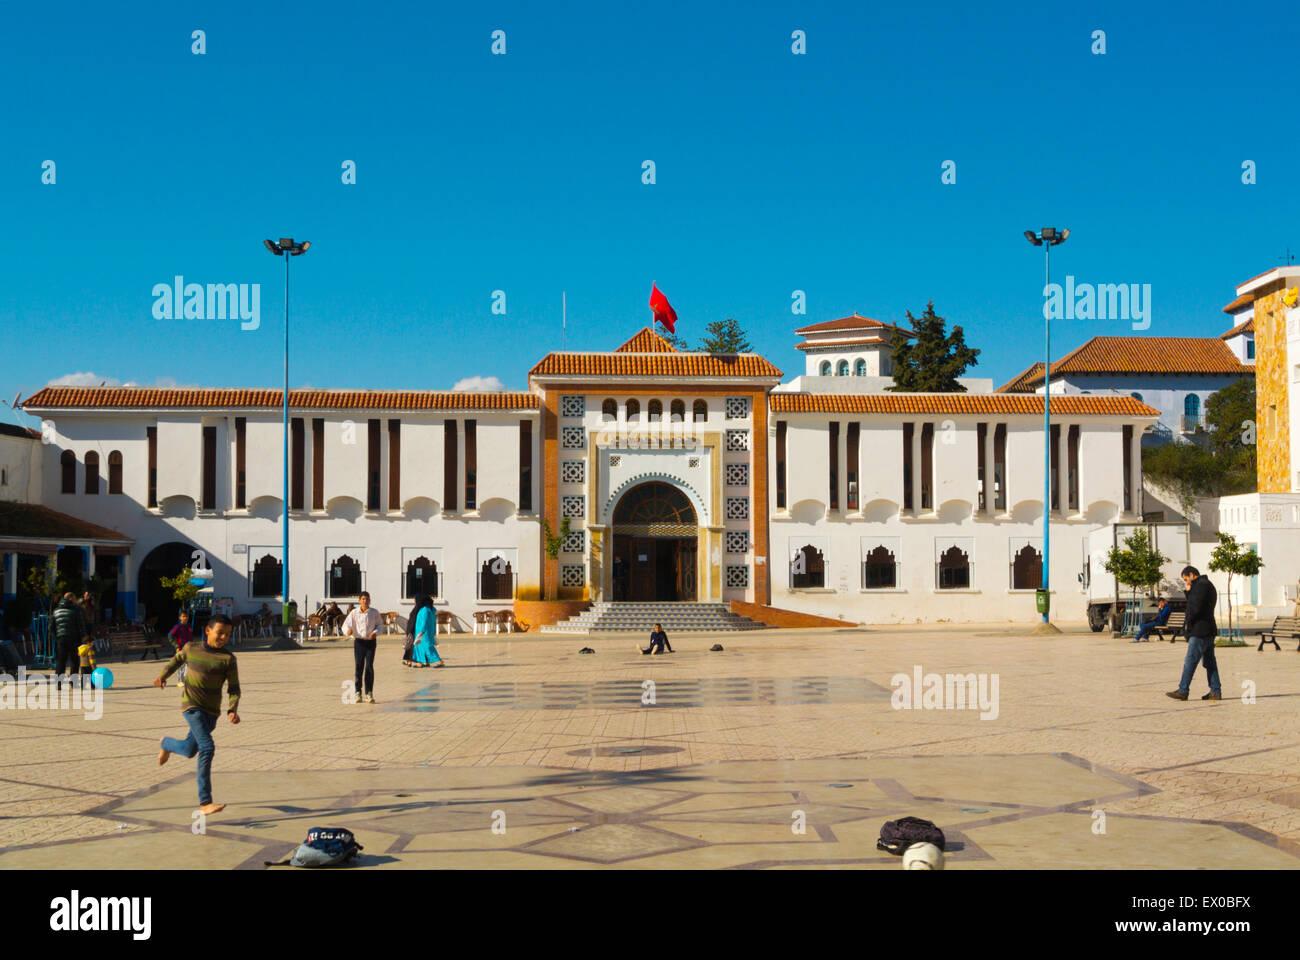 Football game, Plaza Bir Anzaran, new town, Chefchaouen, Chaouen, Morocco, northern Africa - Stock Image